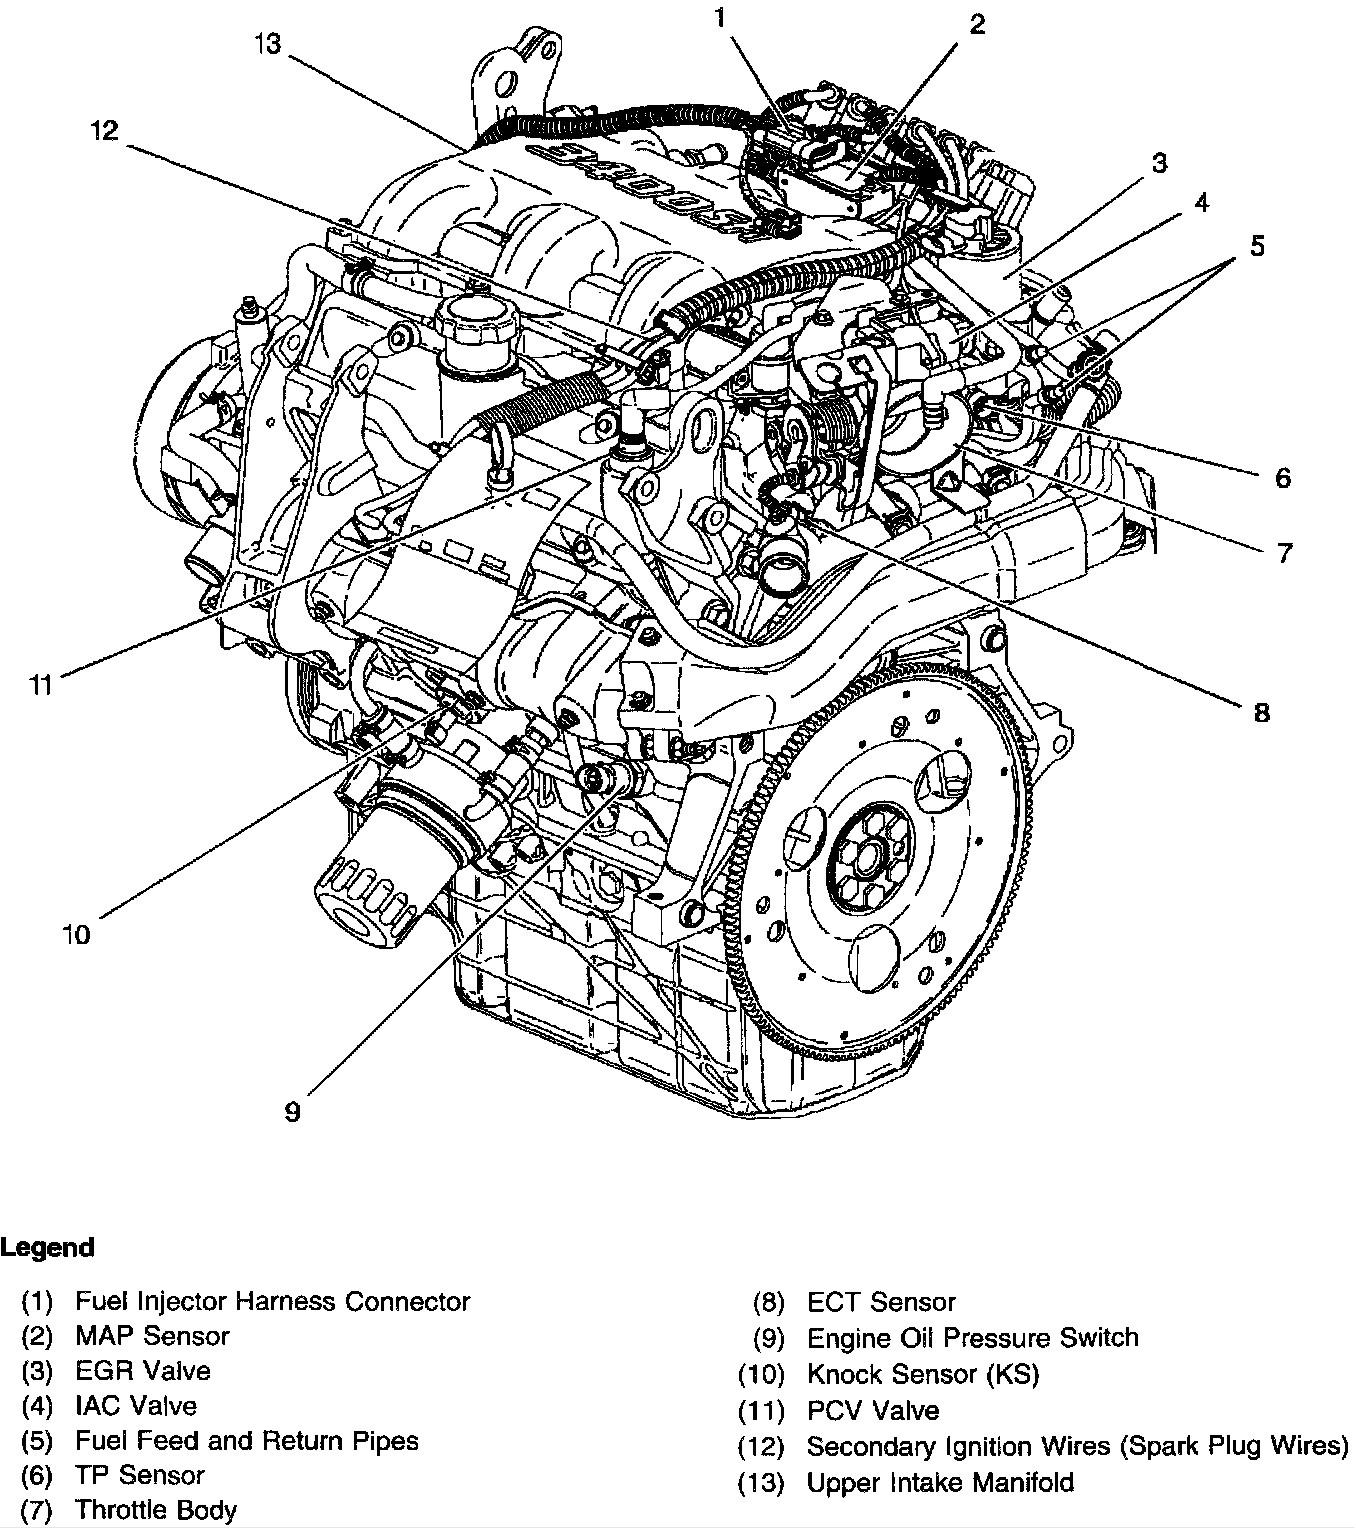 Chevy 3800 Engine Diagram - 1983 Deutz Alternator Wiring Diagram -  coorsaa.butuhbelaian3.jeanjaures37.fr | Rear Engine Diagram 3800 V6 Engine |  | Wiring Diagram Resource